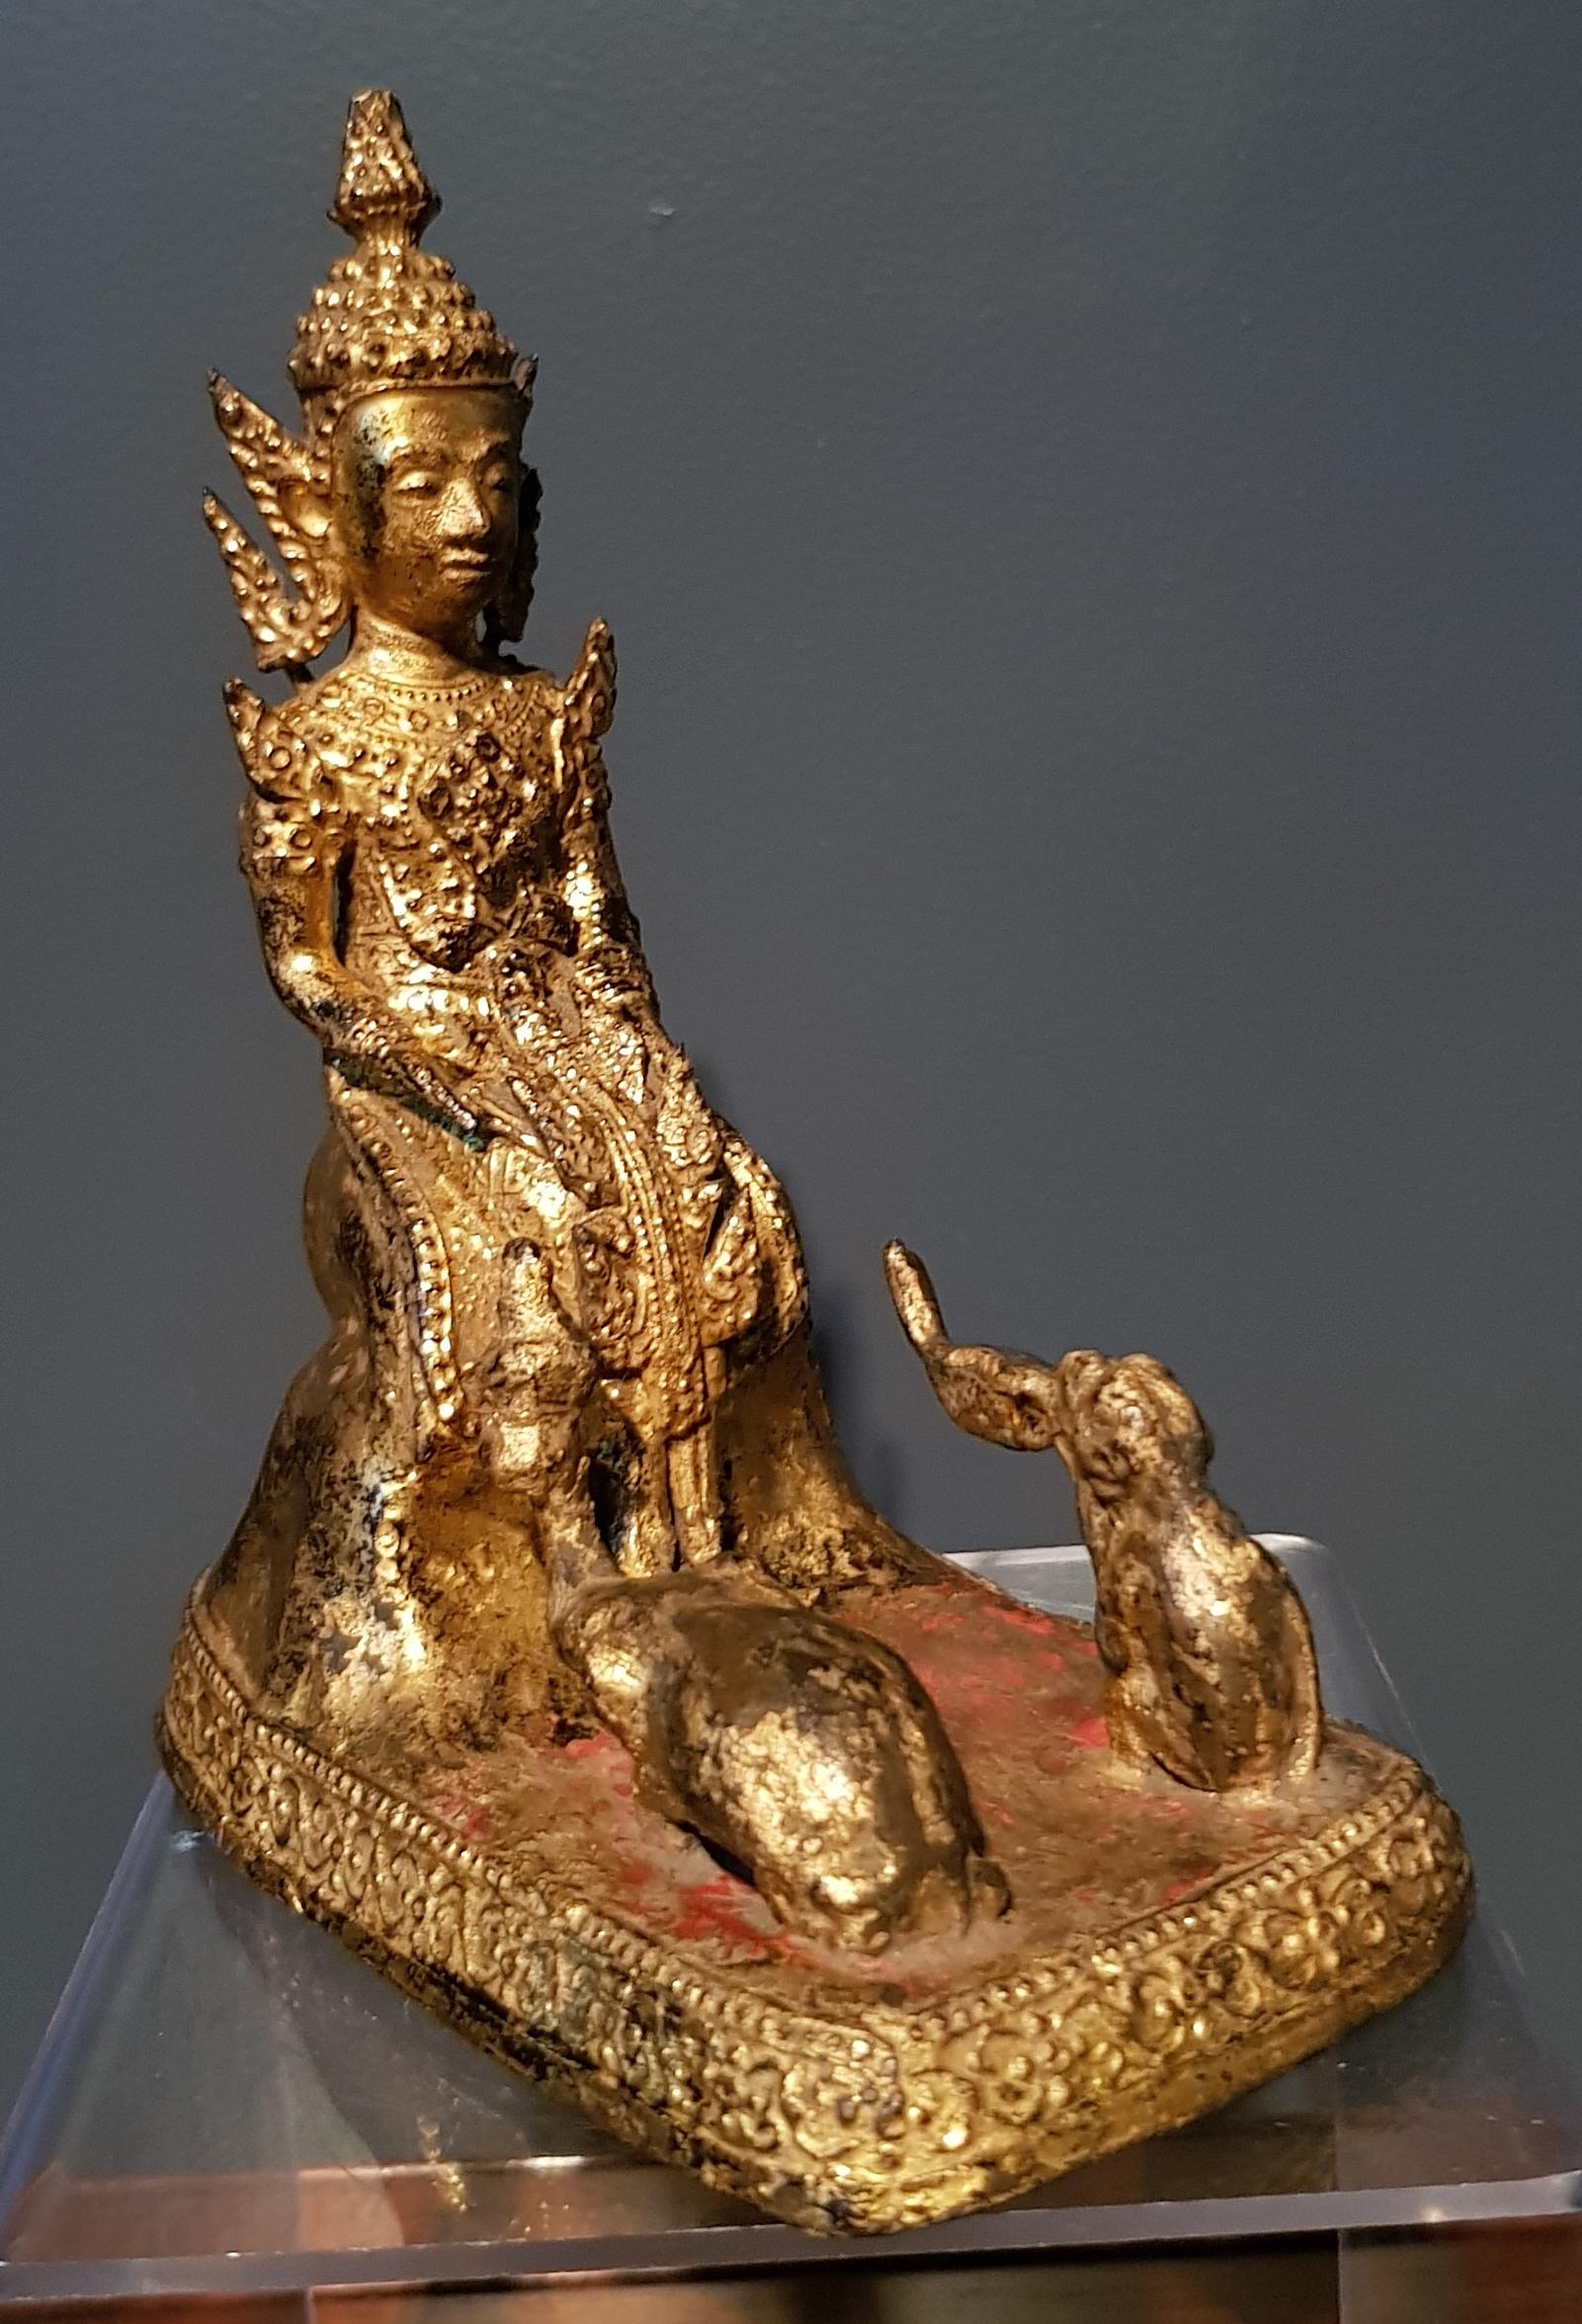 Thaïlande - Bouddha singe et éléphant - Jataka - Rattanakosin - Fin 19ème. Image